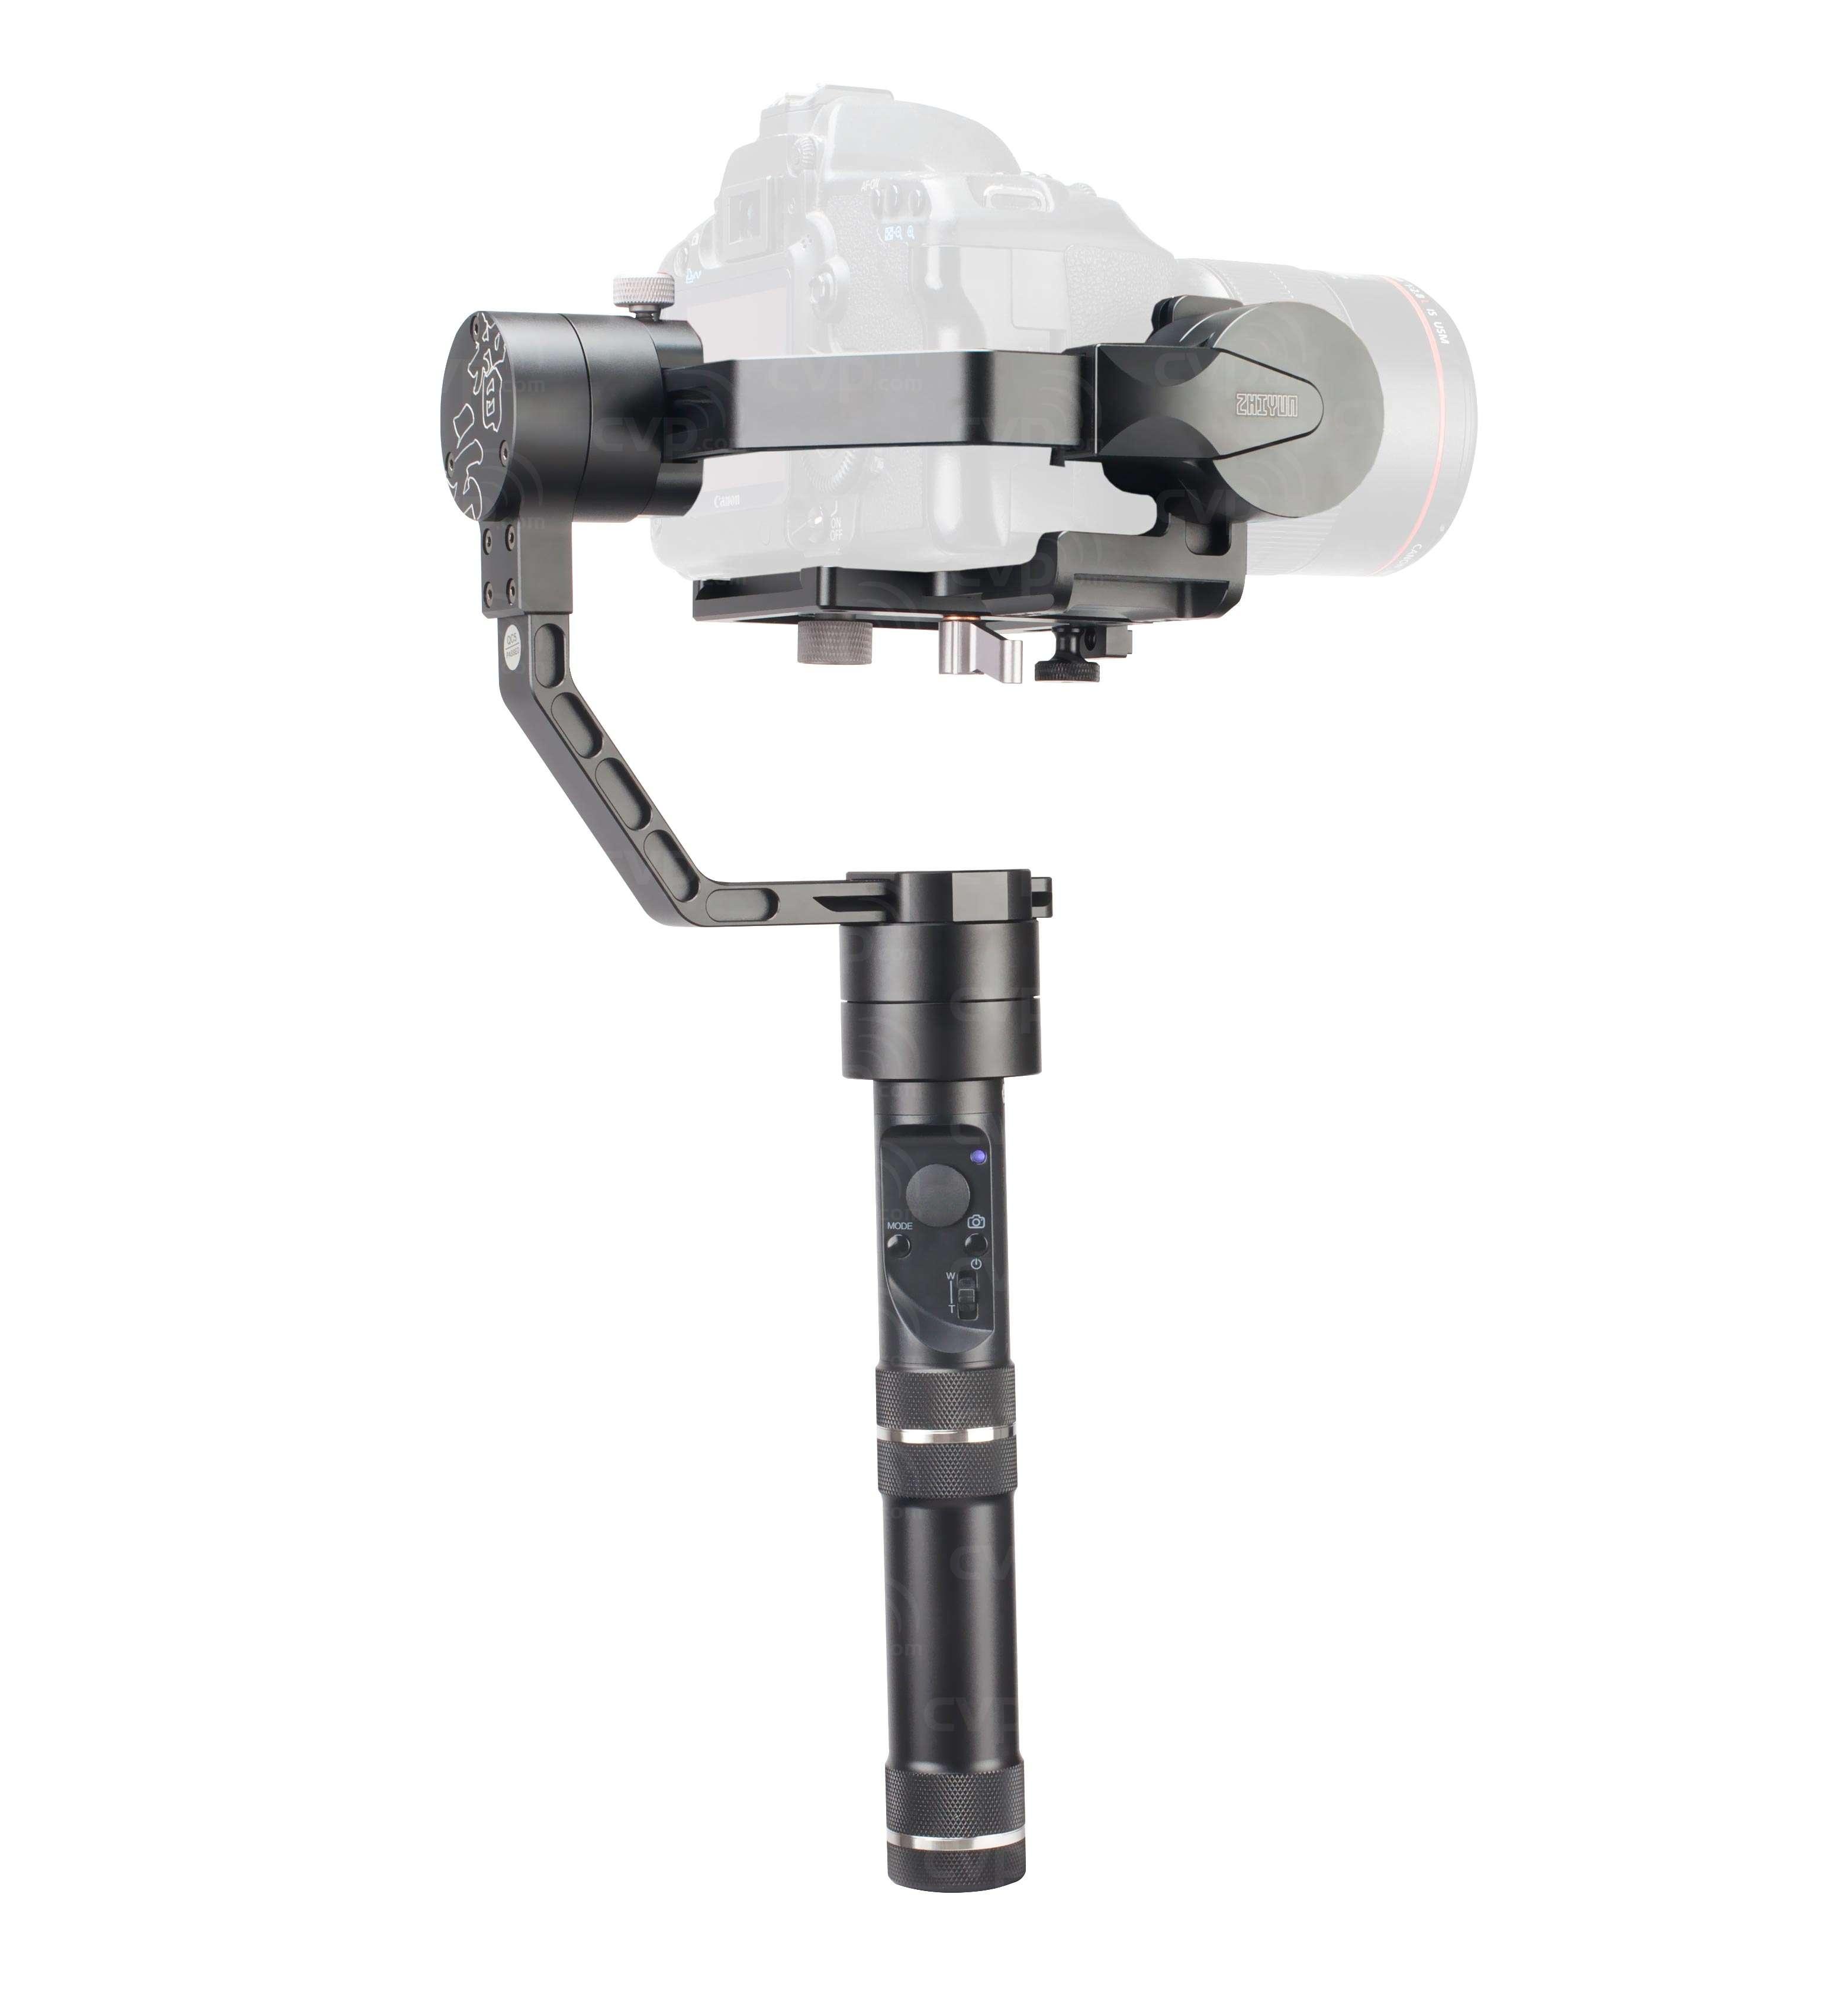 Zhiyun-Tech Crane V2 Gimbal